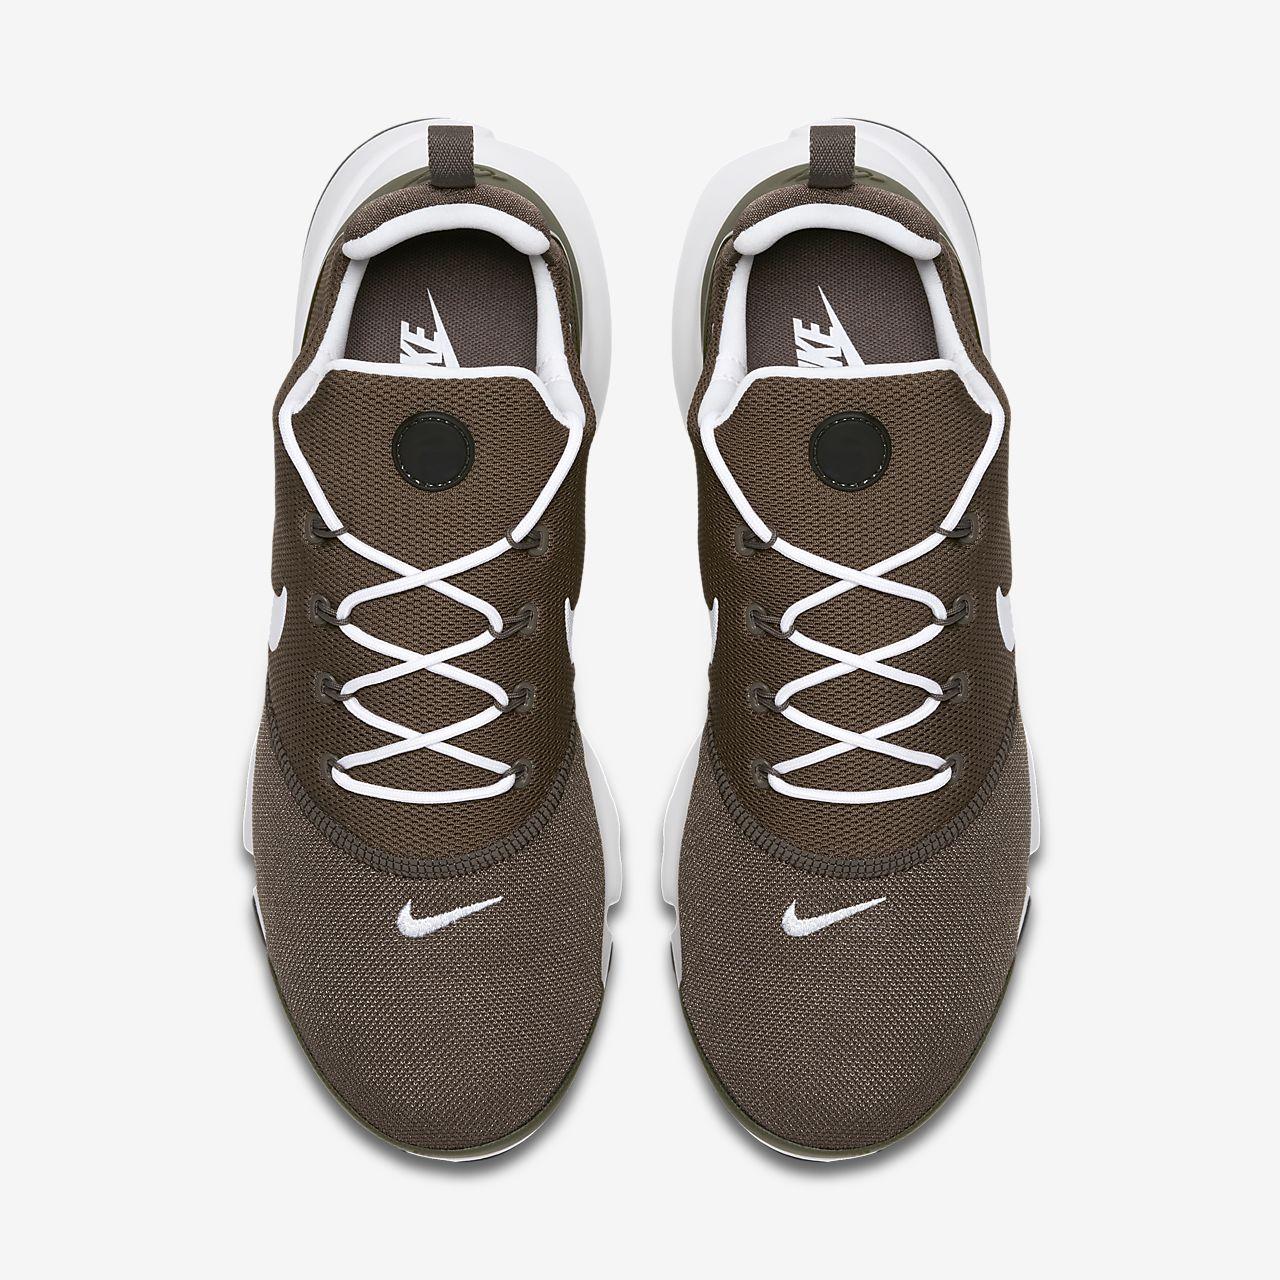 Nike Air Max 97 Gold Bullet OG QS EU 44,5 US 10,5 Neu